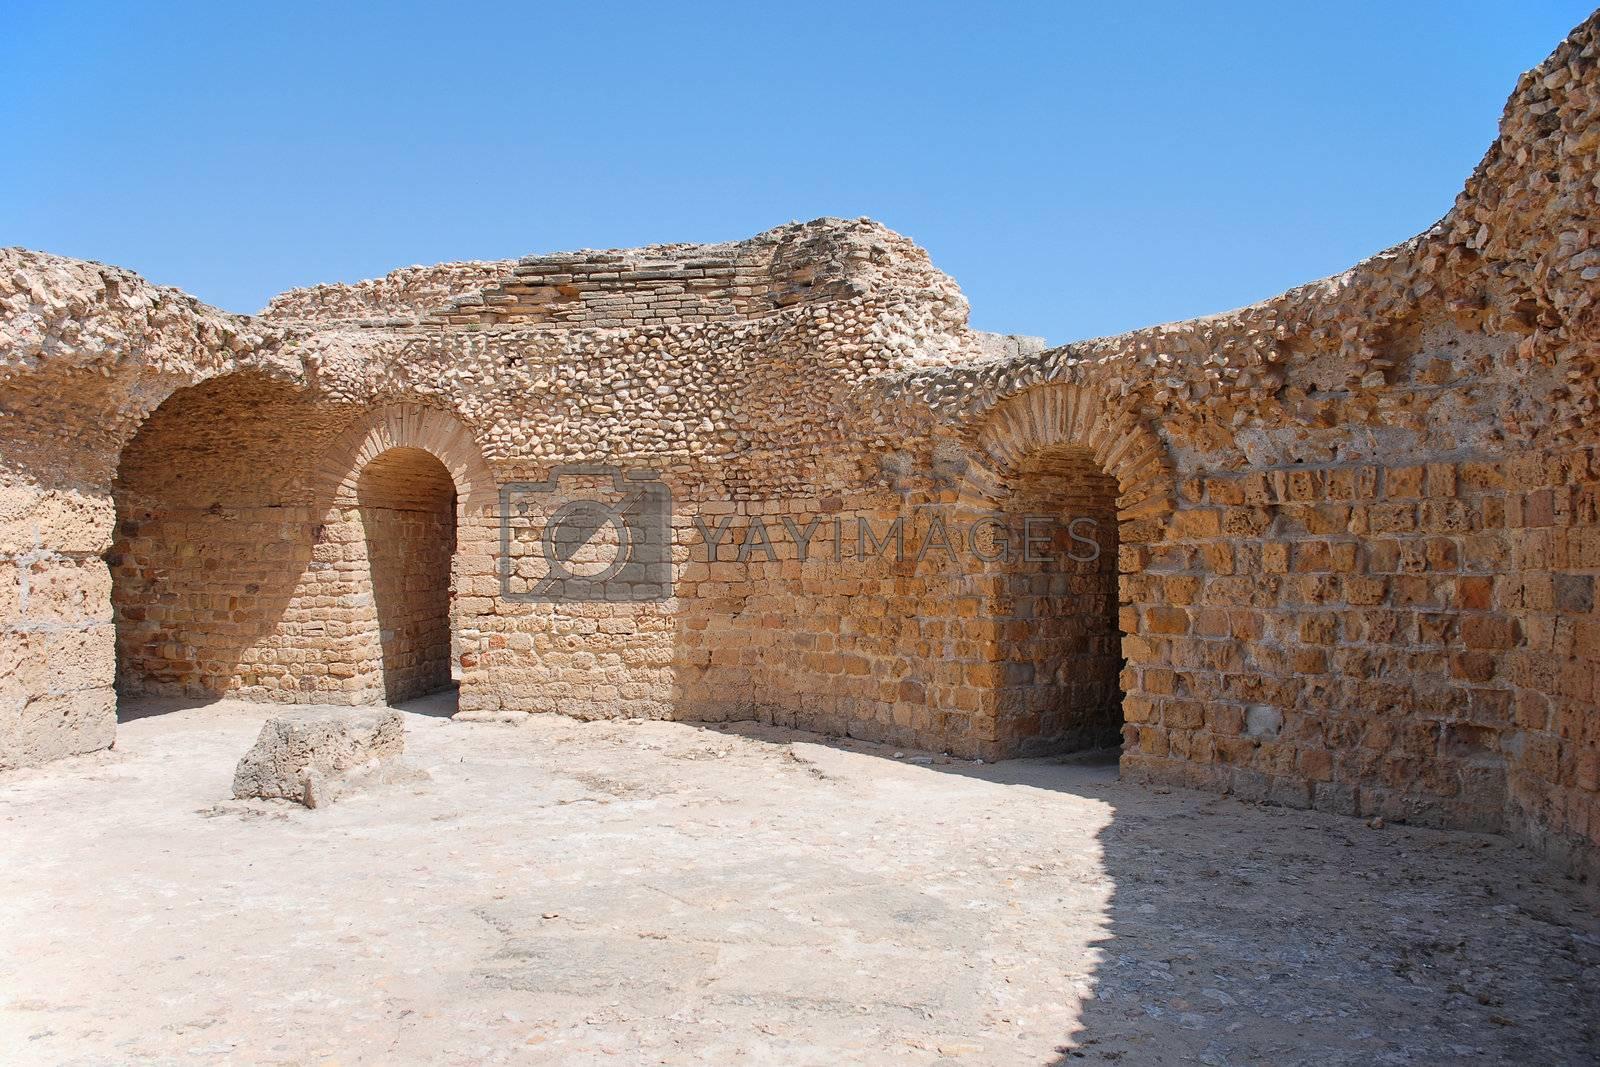 Ancient Ruins of the Baths of Antoninus Pius in Carthage, Tunisia. The UNESCO World Heritage.